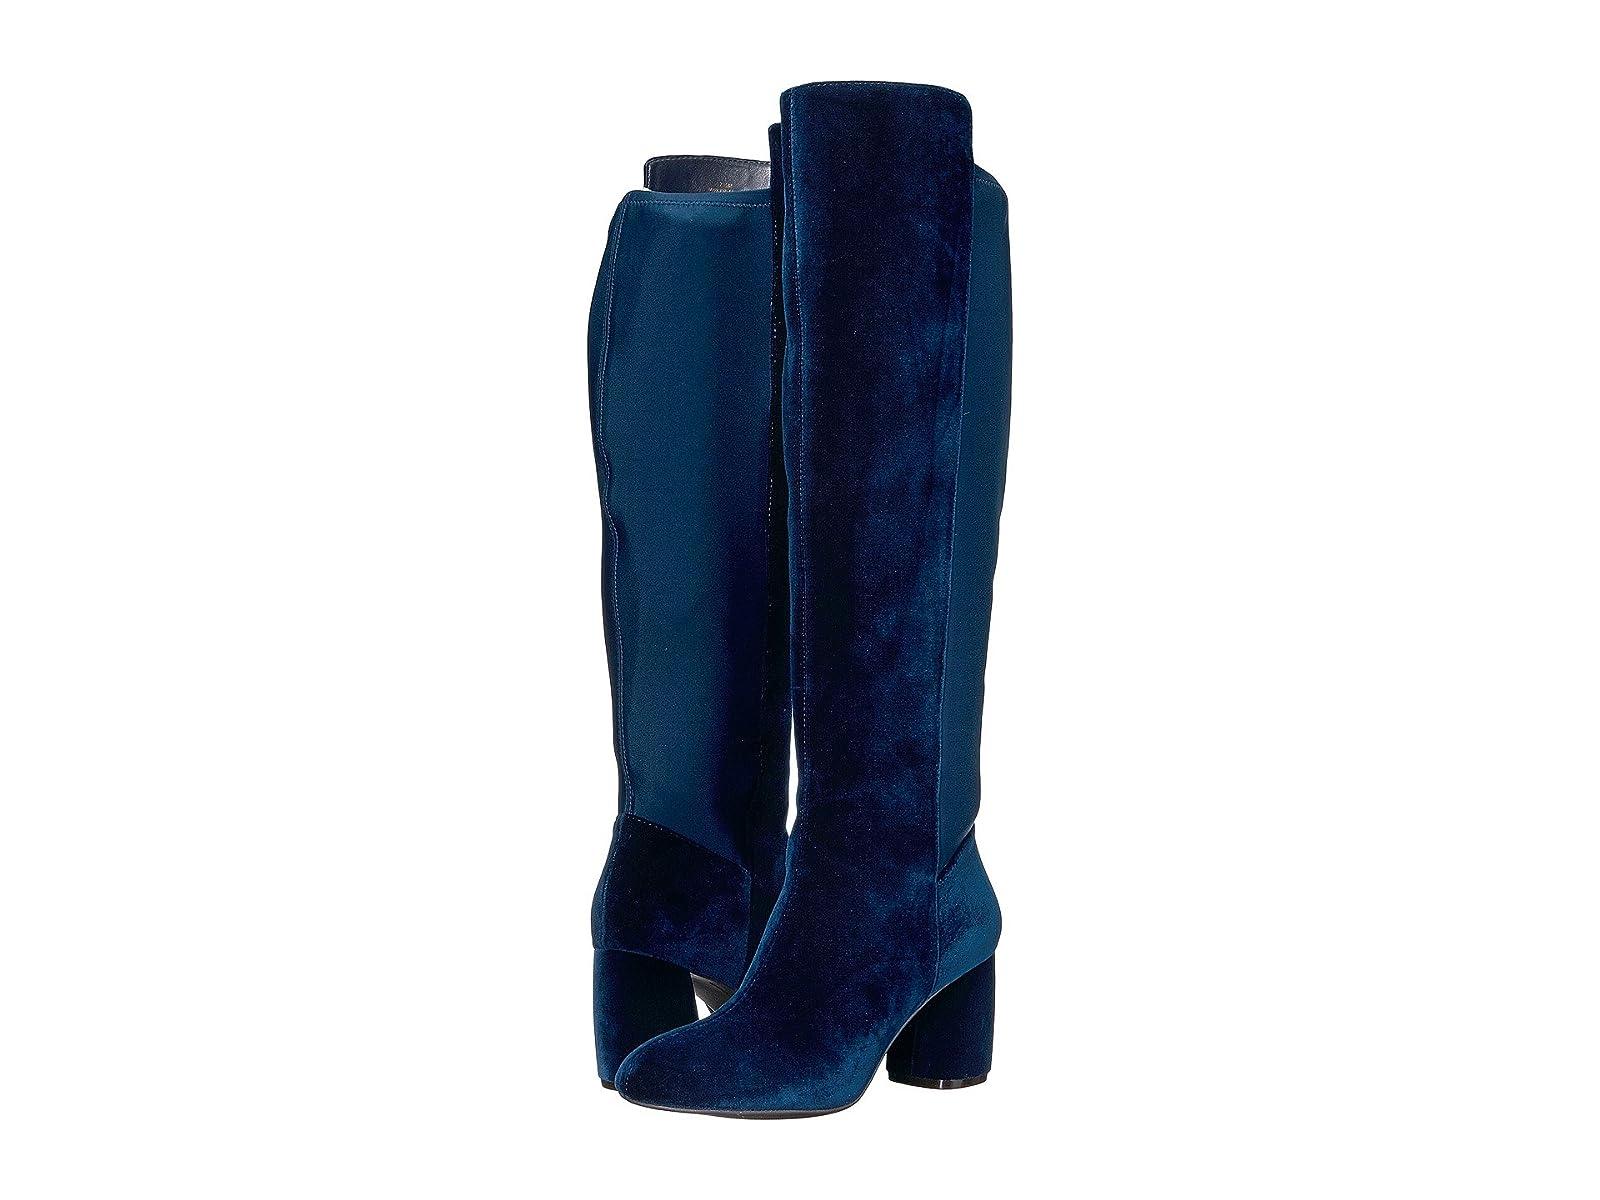 Nine West KeriannaCheap and distinctive eye-catching shoes